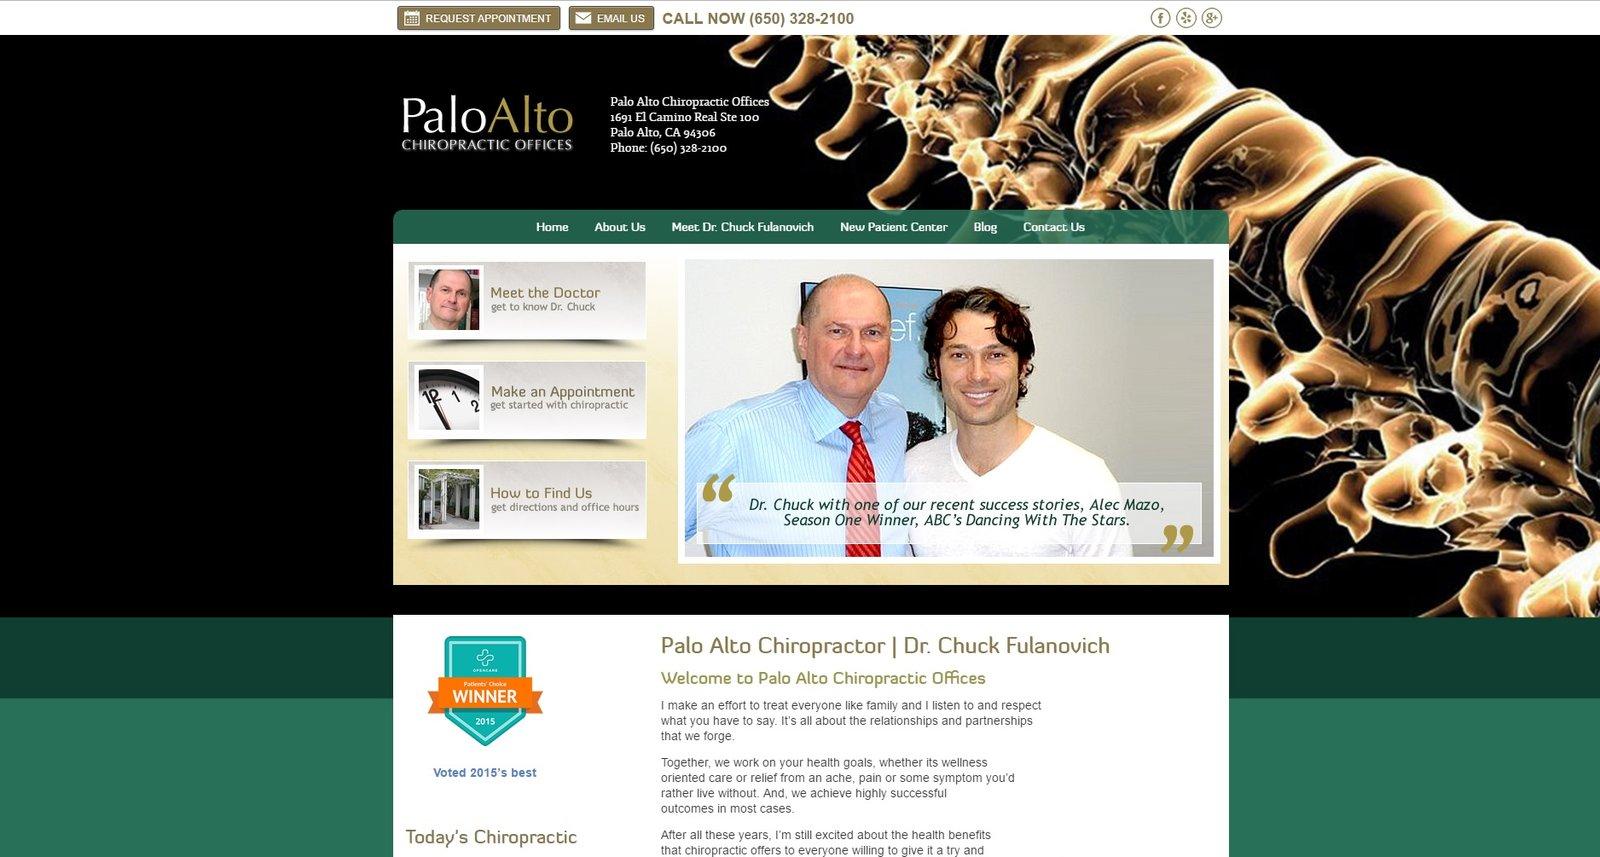 web design for Palo Alto Chiropractic